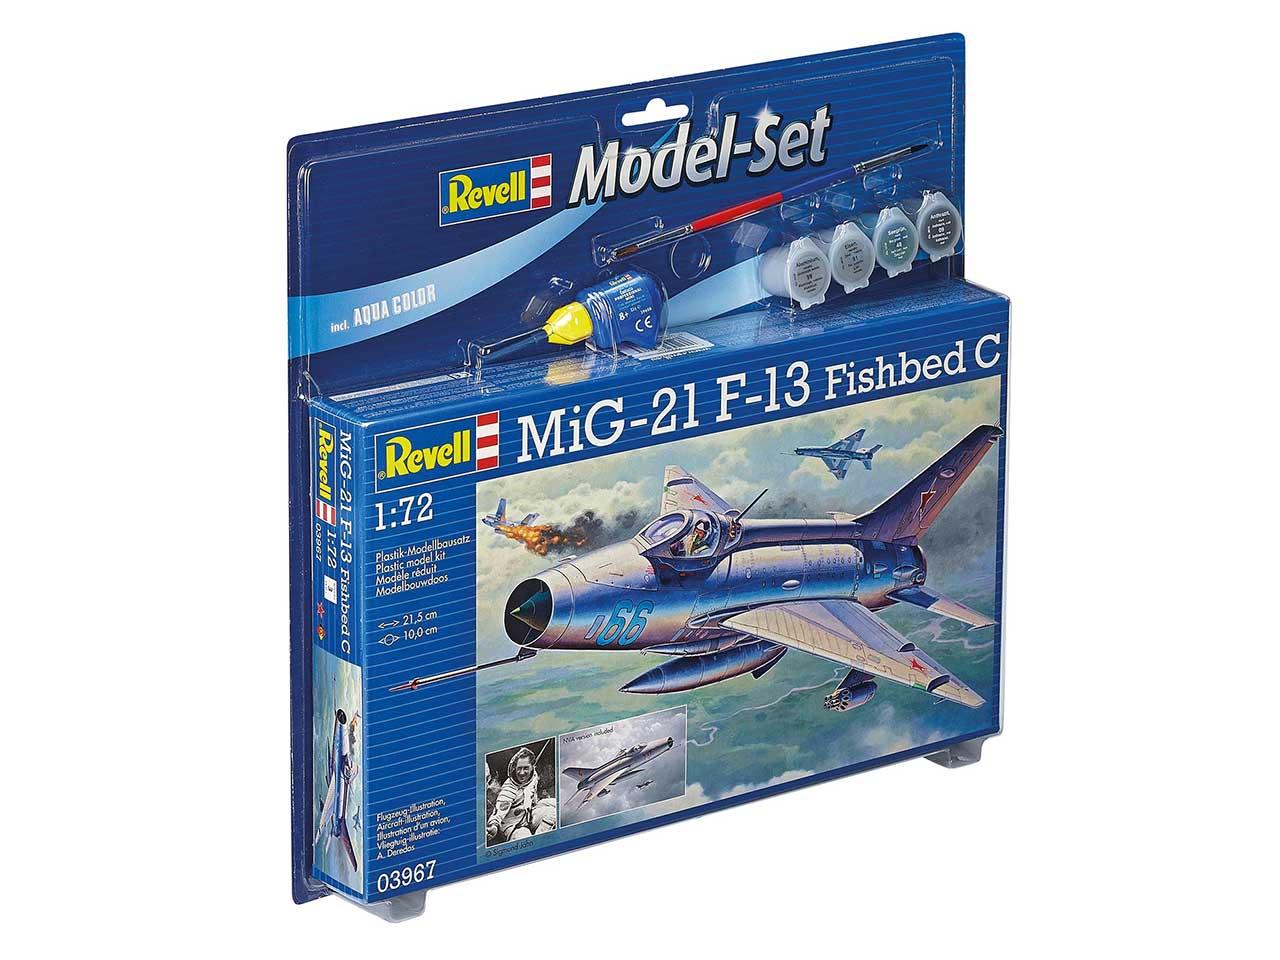 ModelSet letadlo 63967 - MiG-21 F-13 Fishbed C (1:72)